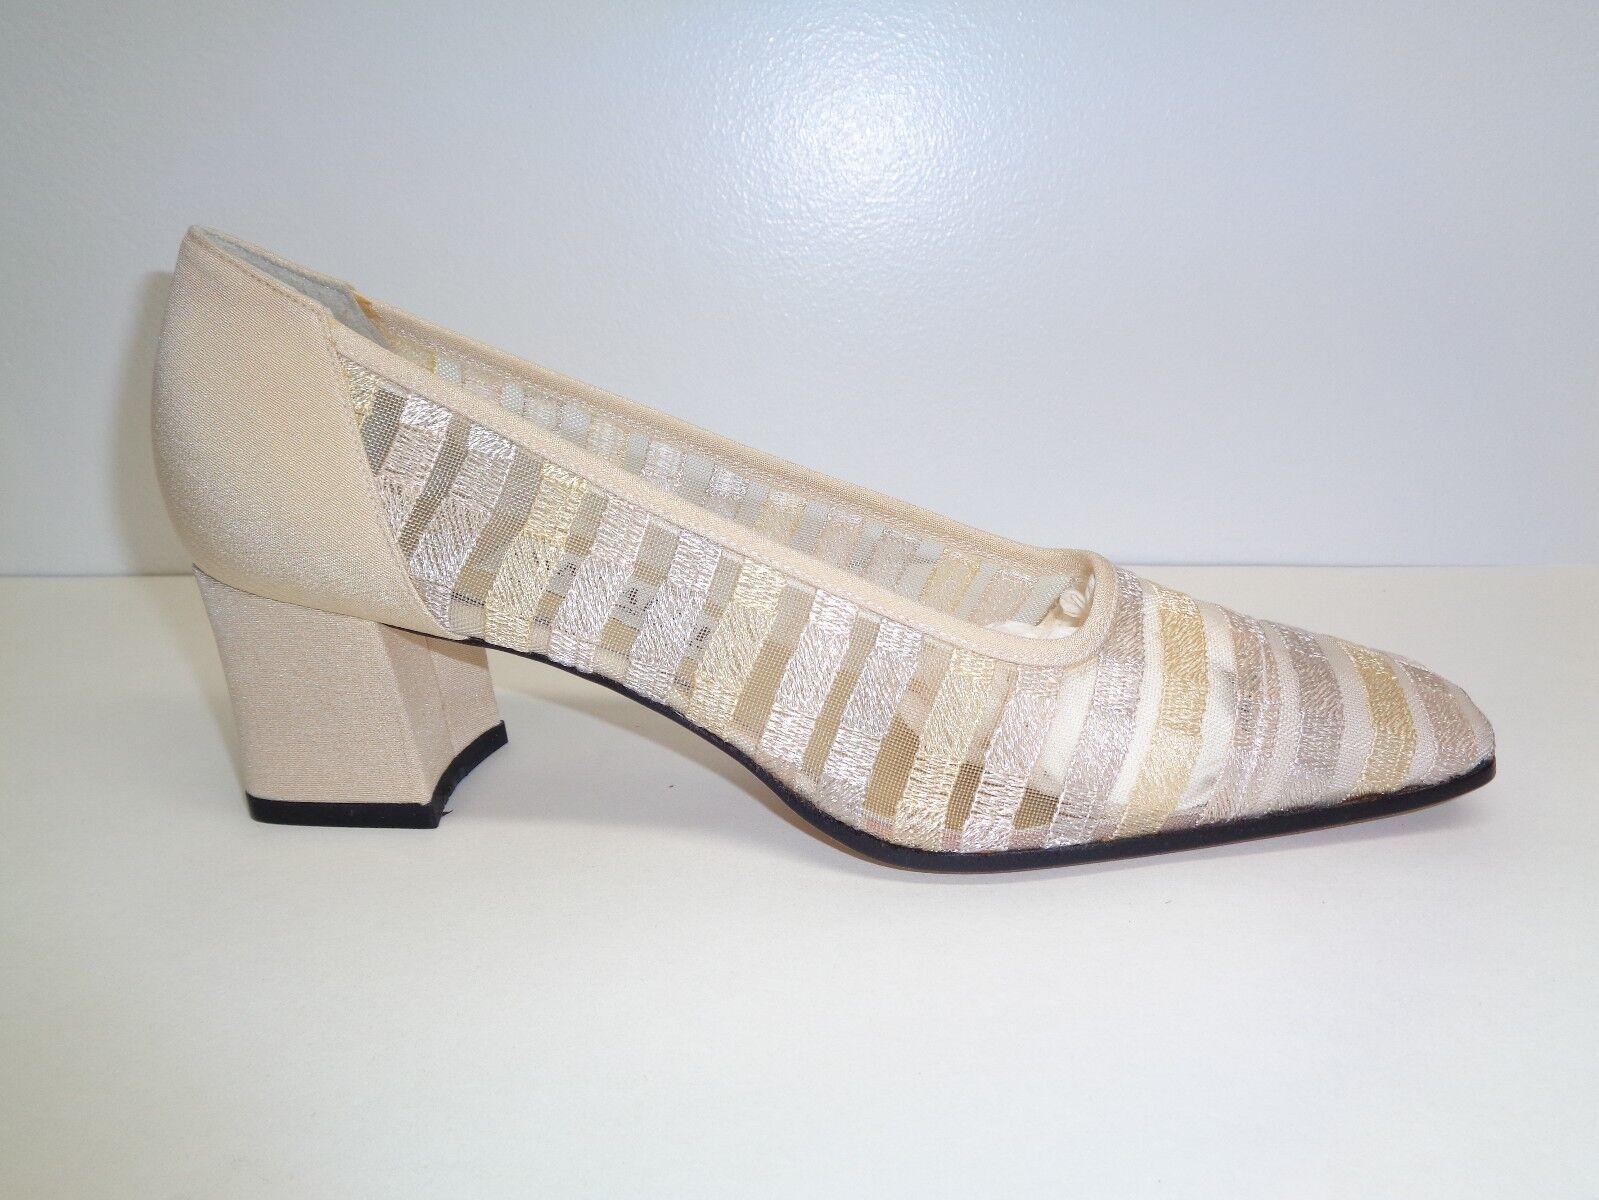 Pancaldi Size 8 AA Narrow P9041 Beige Mesh Shoes Fabric Heels Pumps New Womens Shoes Mesh be7628